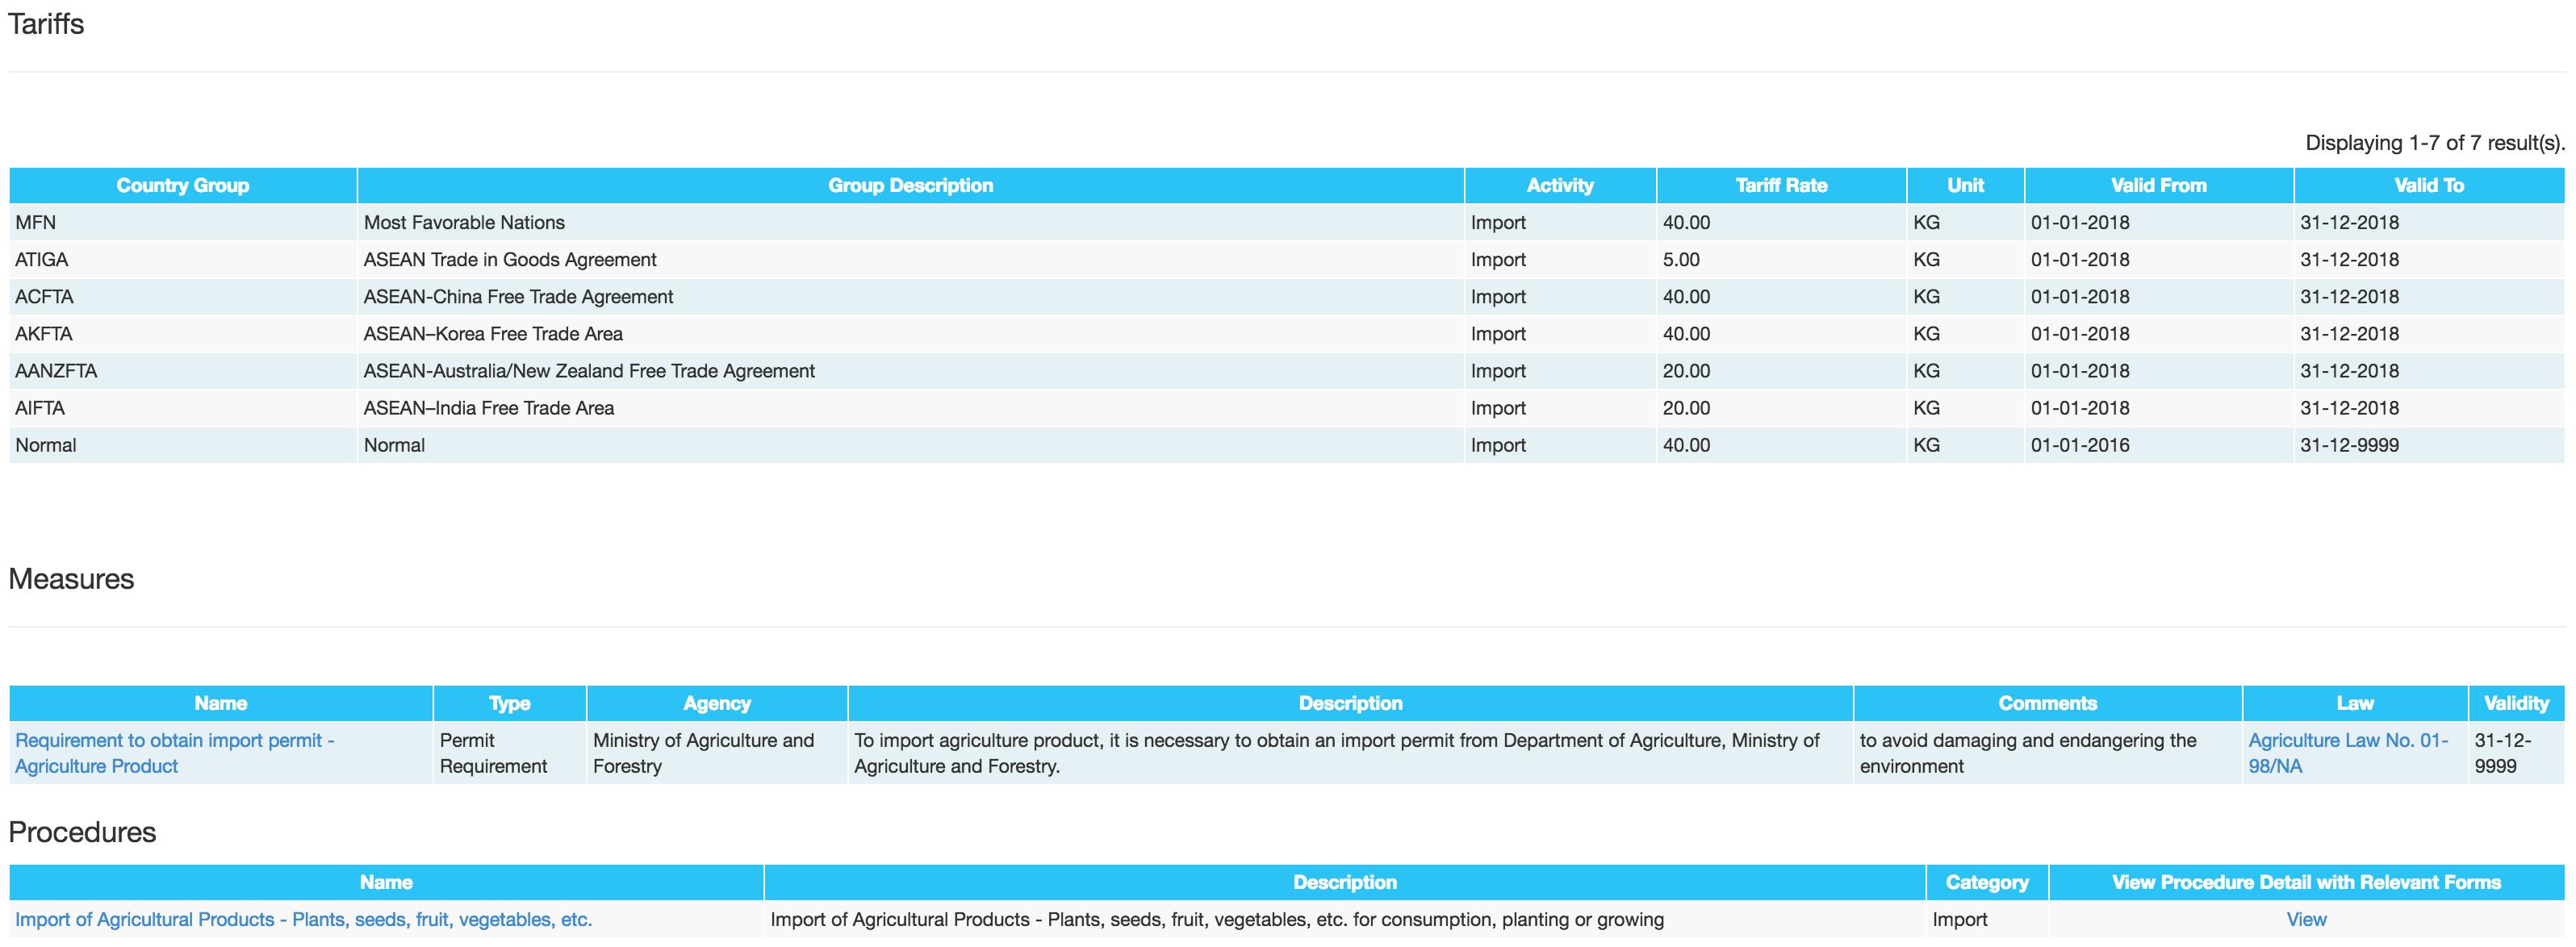 hs-code-tariff-customs-laos